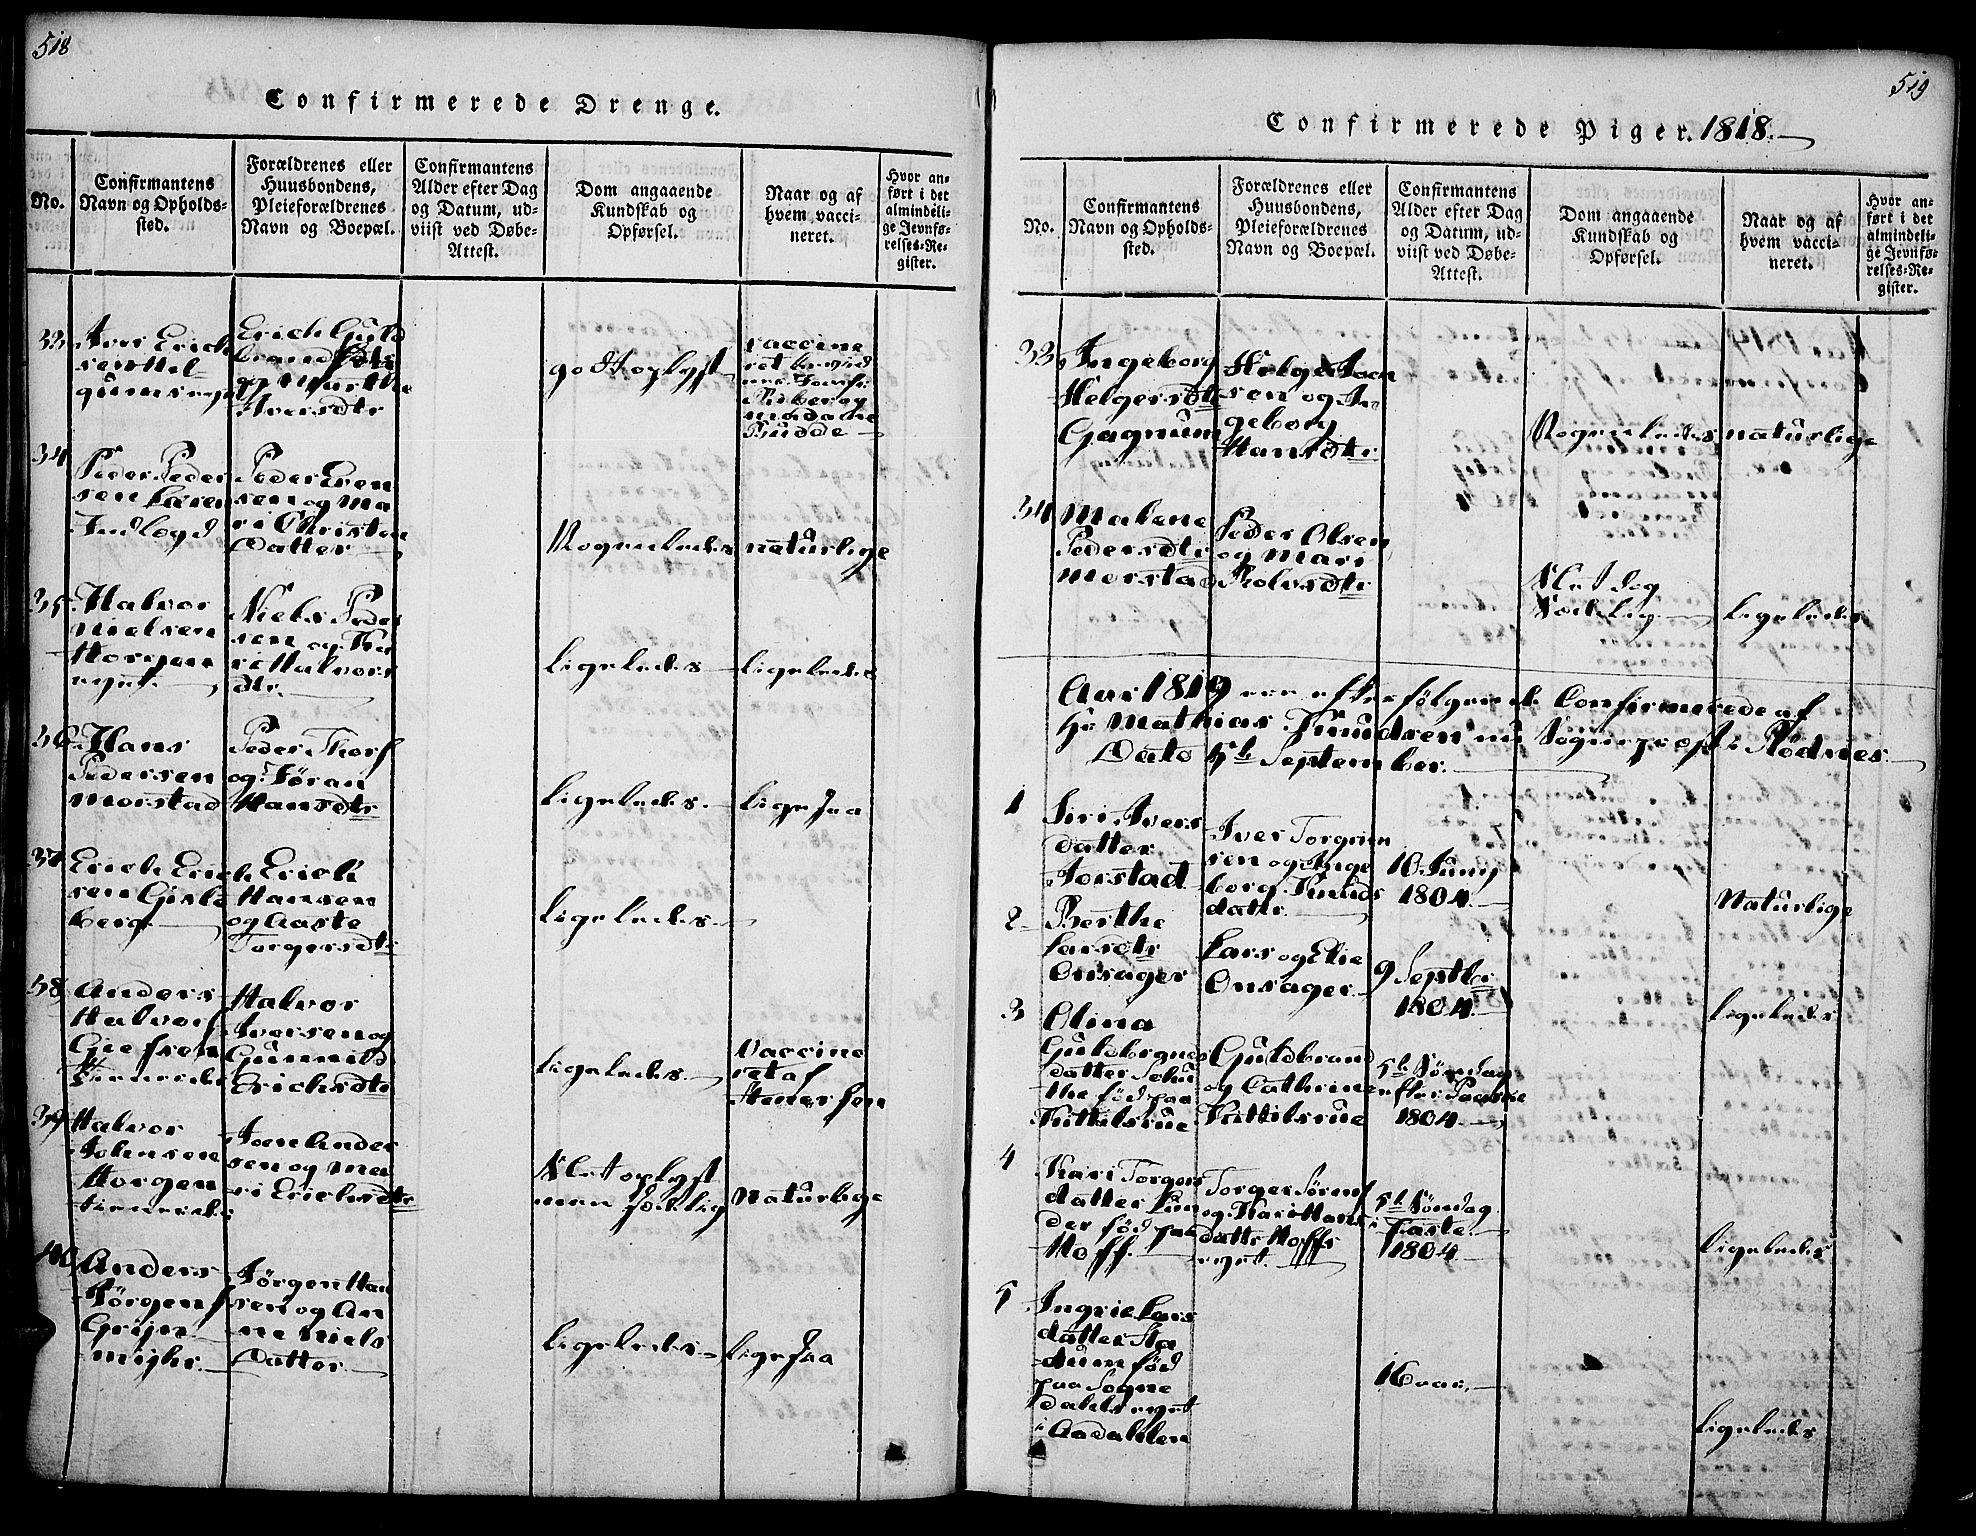 SAH, Gran prestekontor, Ministerialbok nr. 9, 1815-1824, s. 518-519